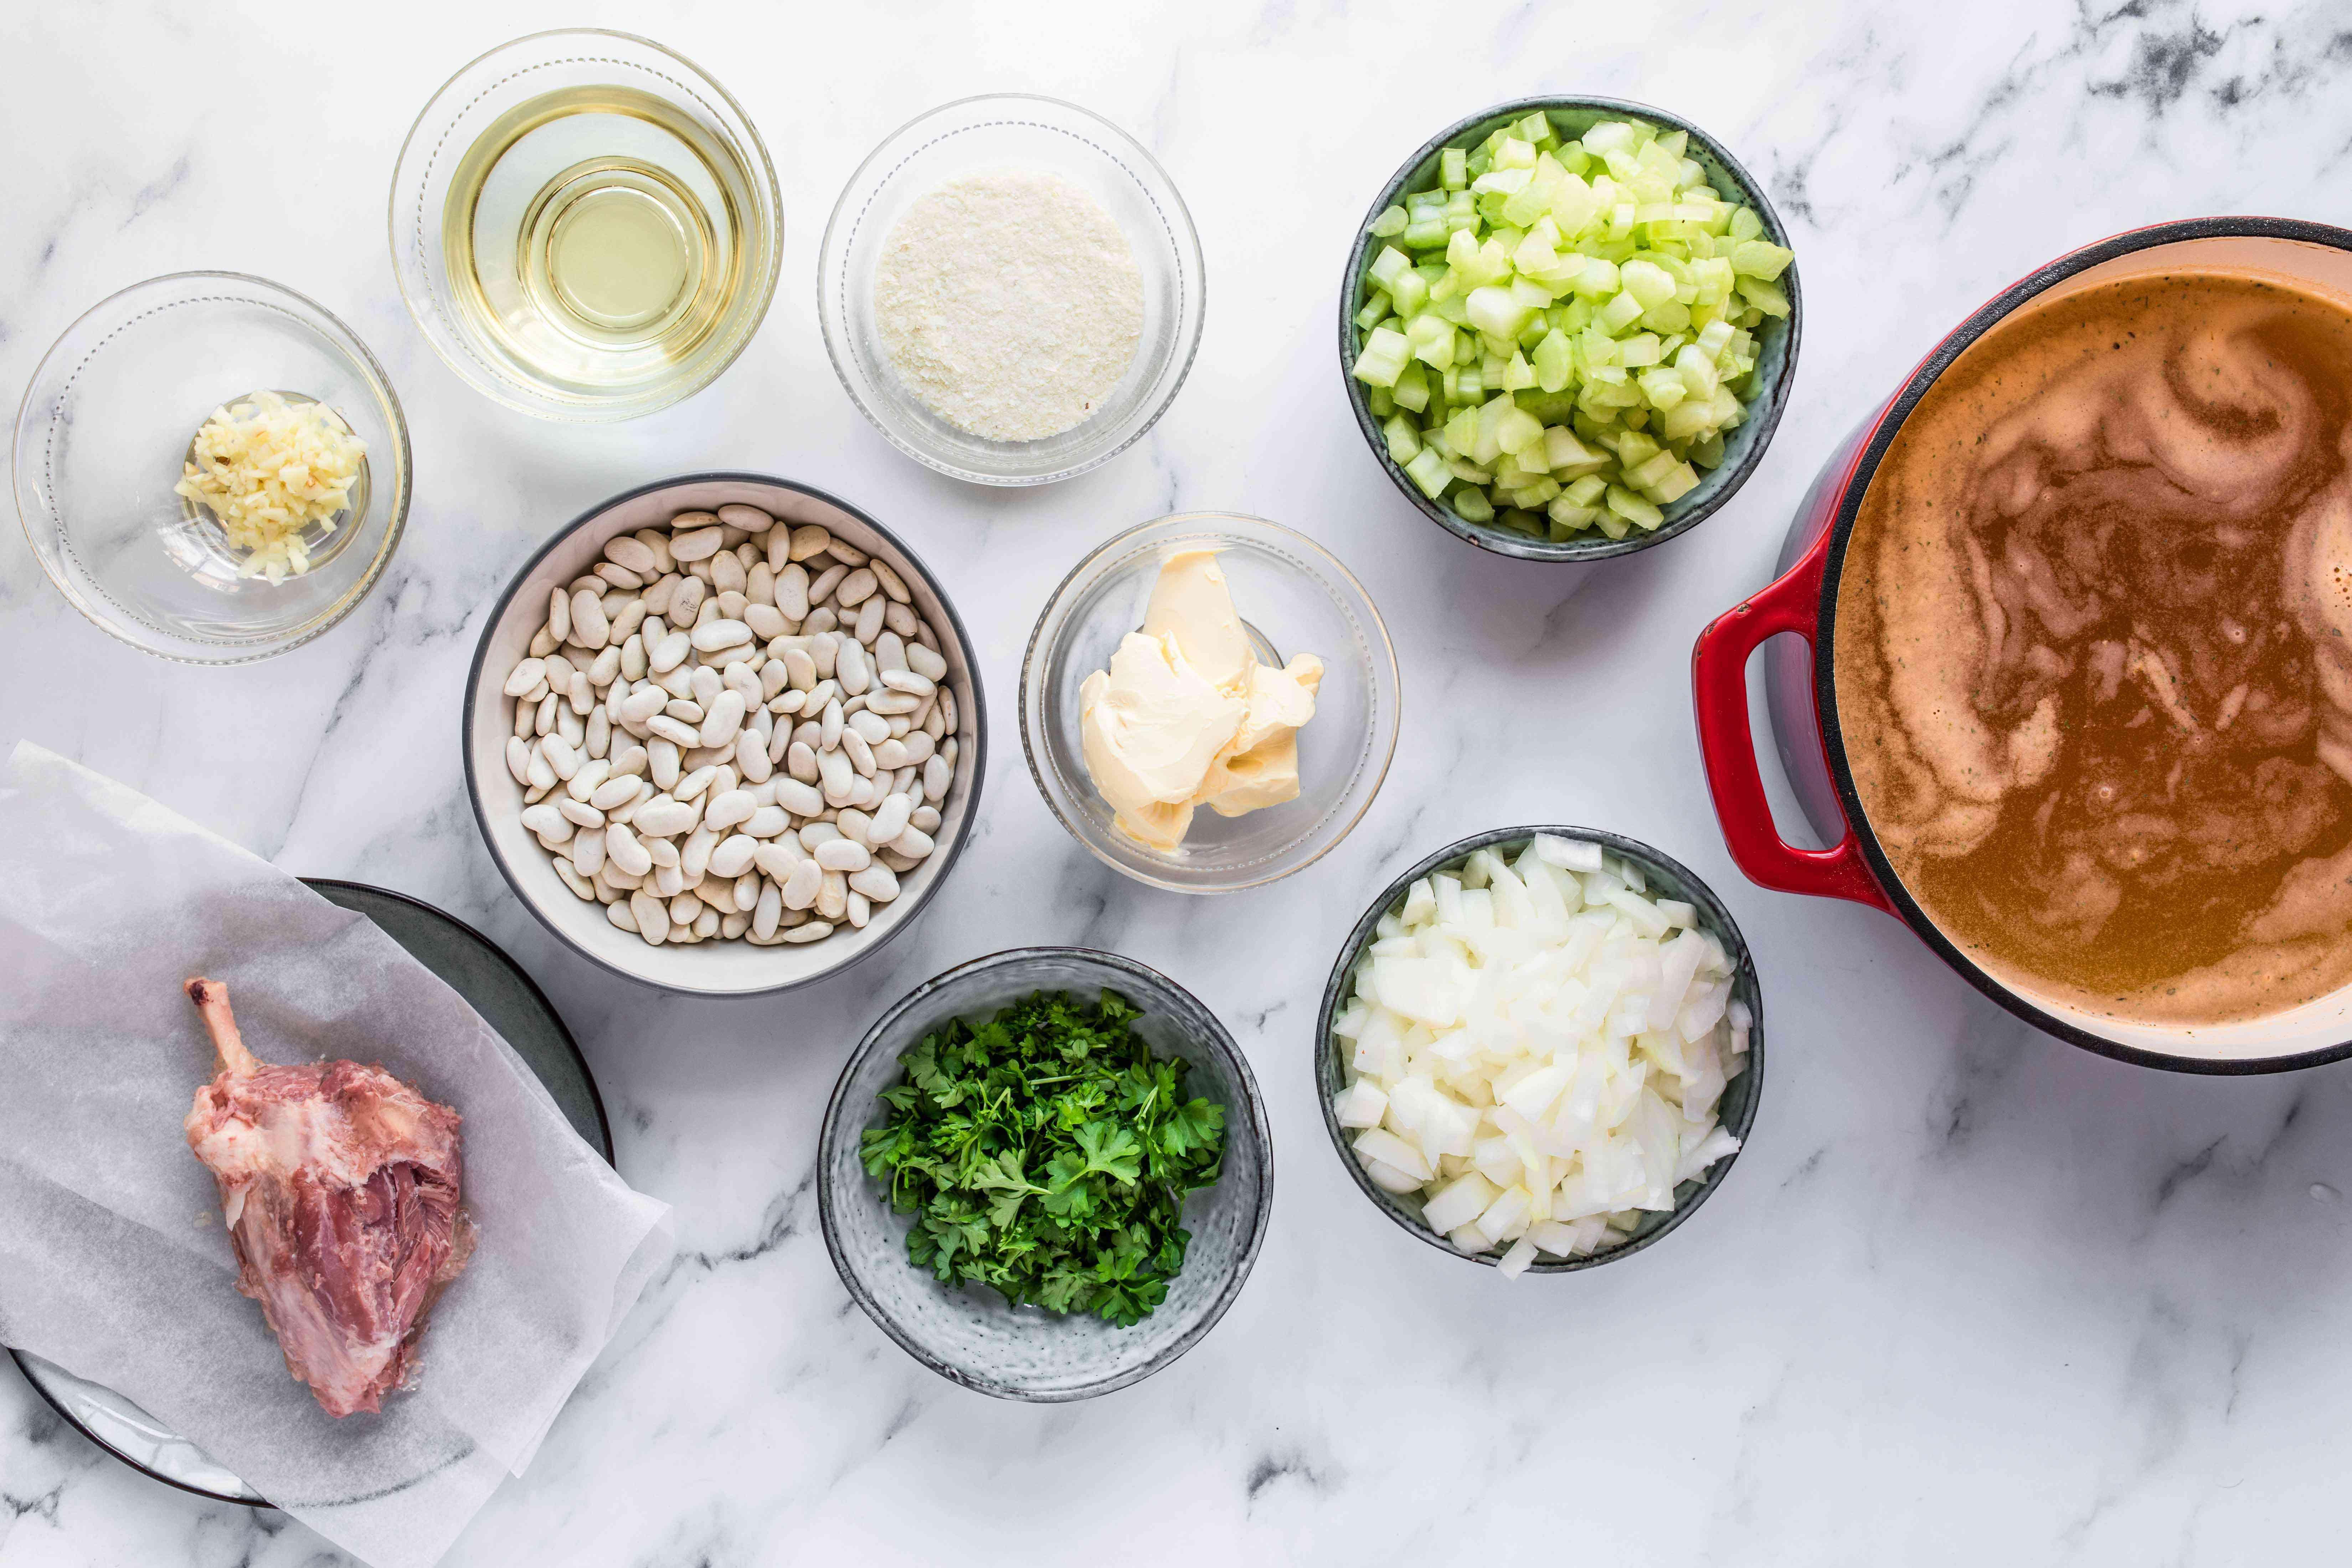 Ingredients for senate bean soup